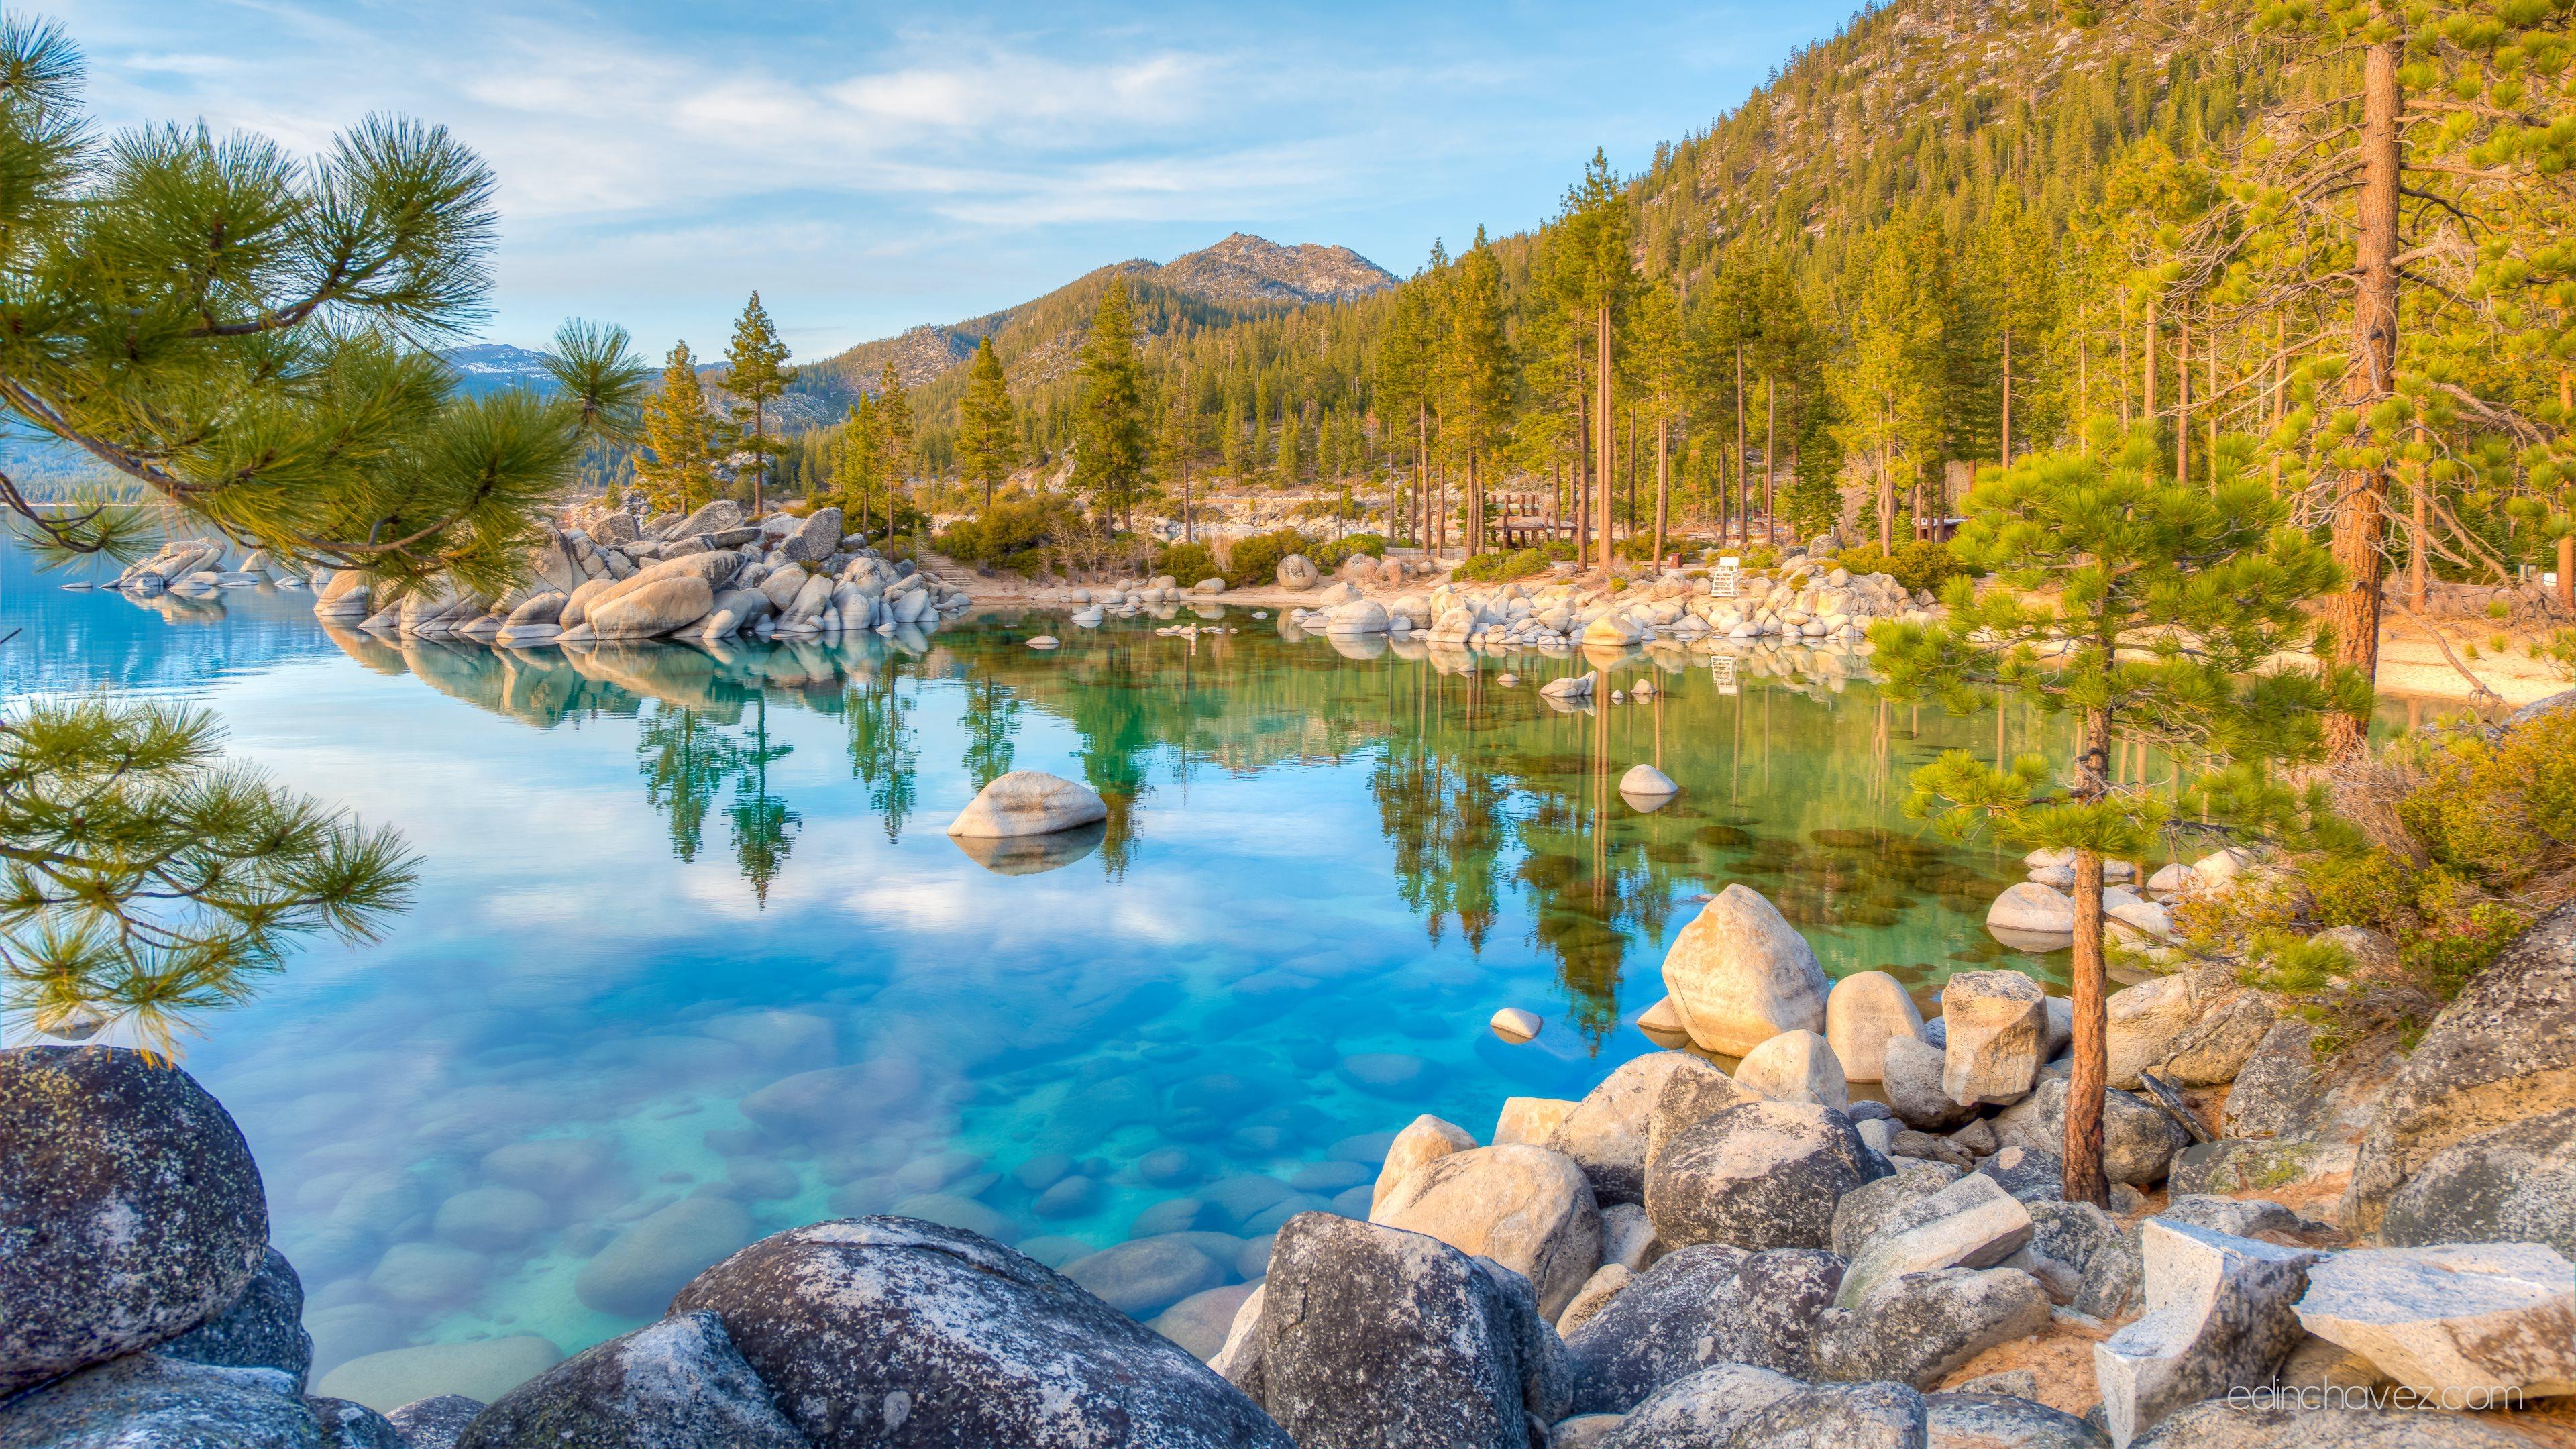 wallpaper lake tahoe ultra hd 4k 3840x2160